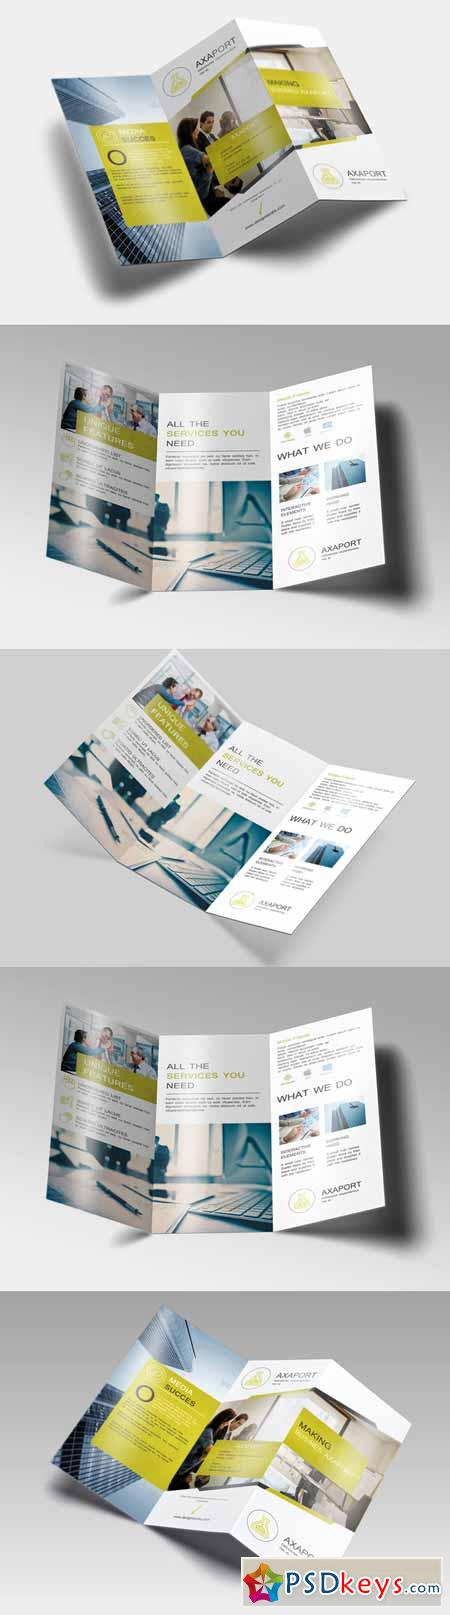 one fold brochure